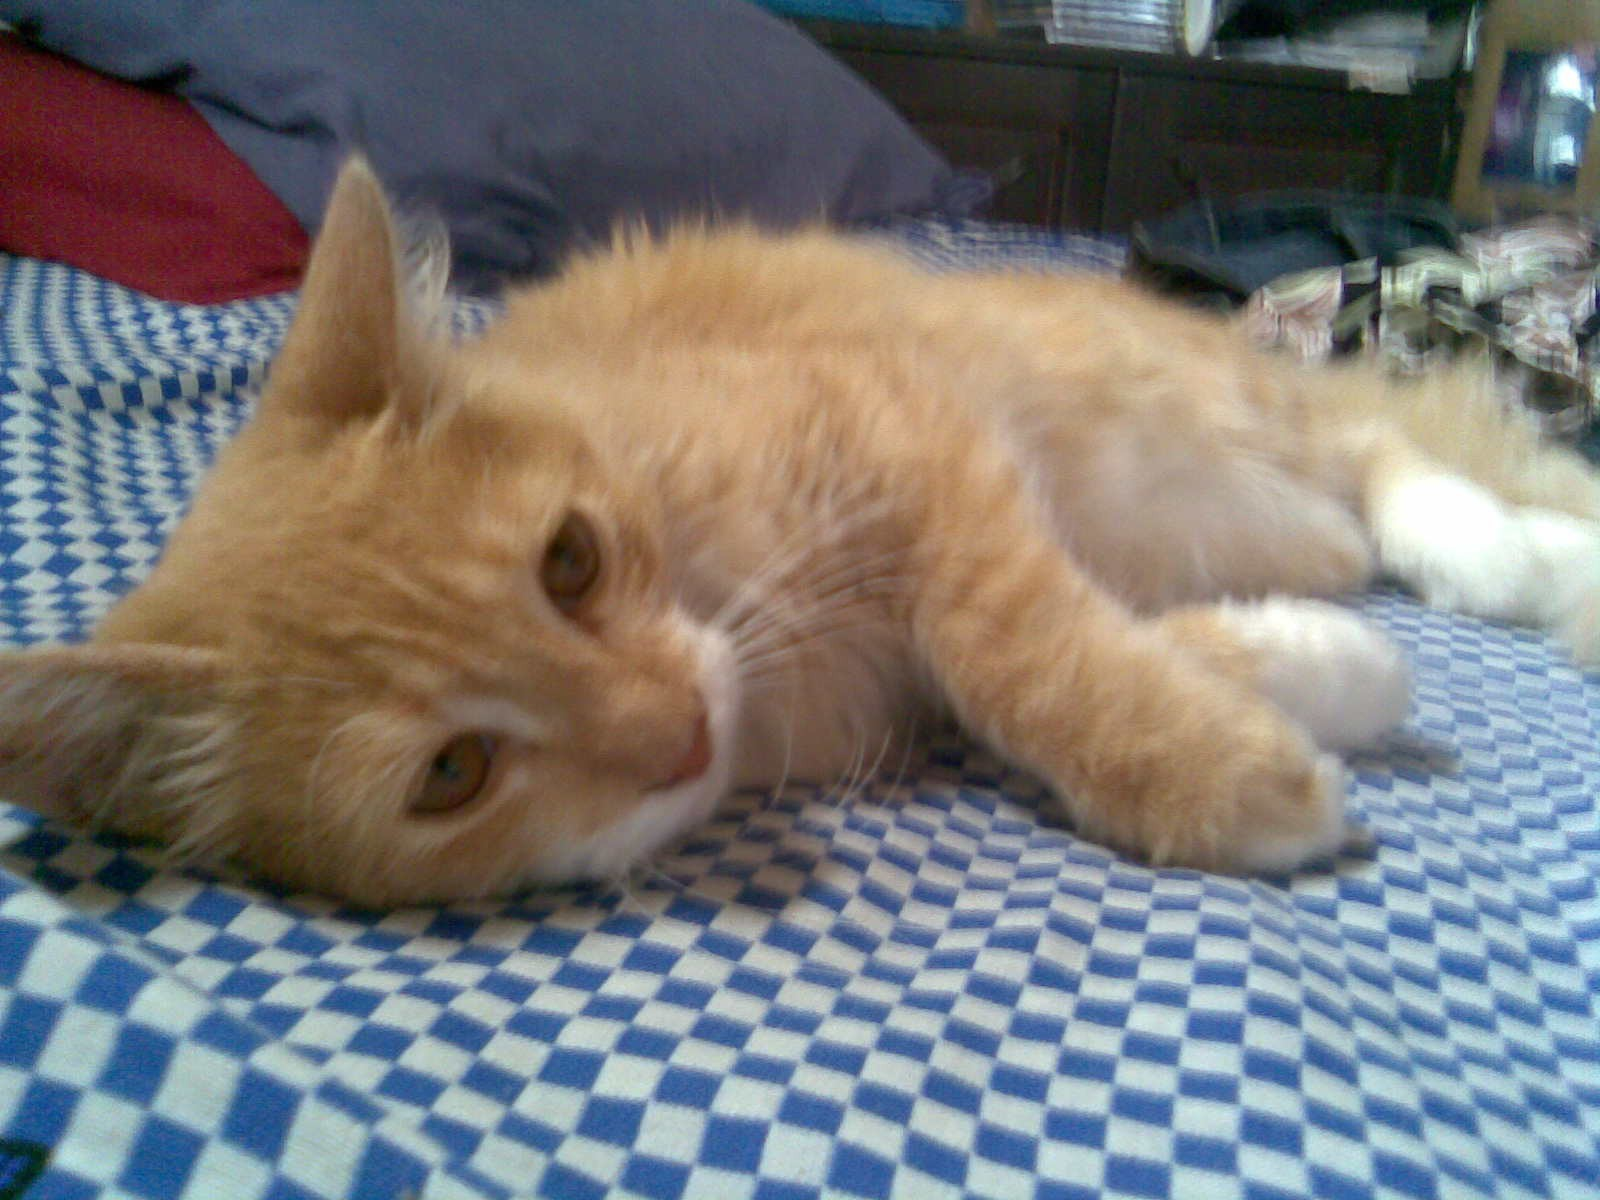 http://4.bp.blogspot.com/_qkIAqZWIIZQ/TCU1-YL_ZRI/AAAAAAAAAVM/MurDCLpy13w/s1600/Imagem057.jpg+gato.jpg